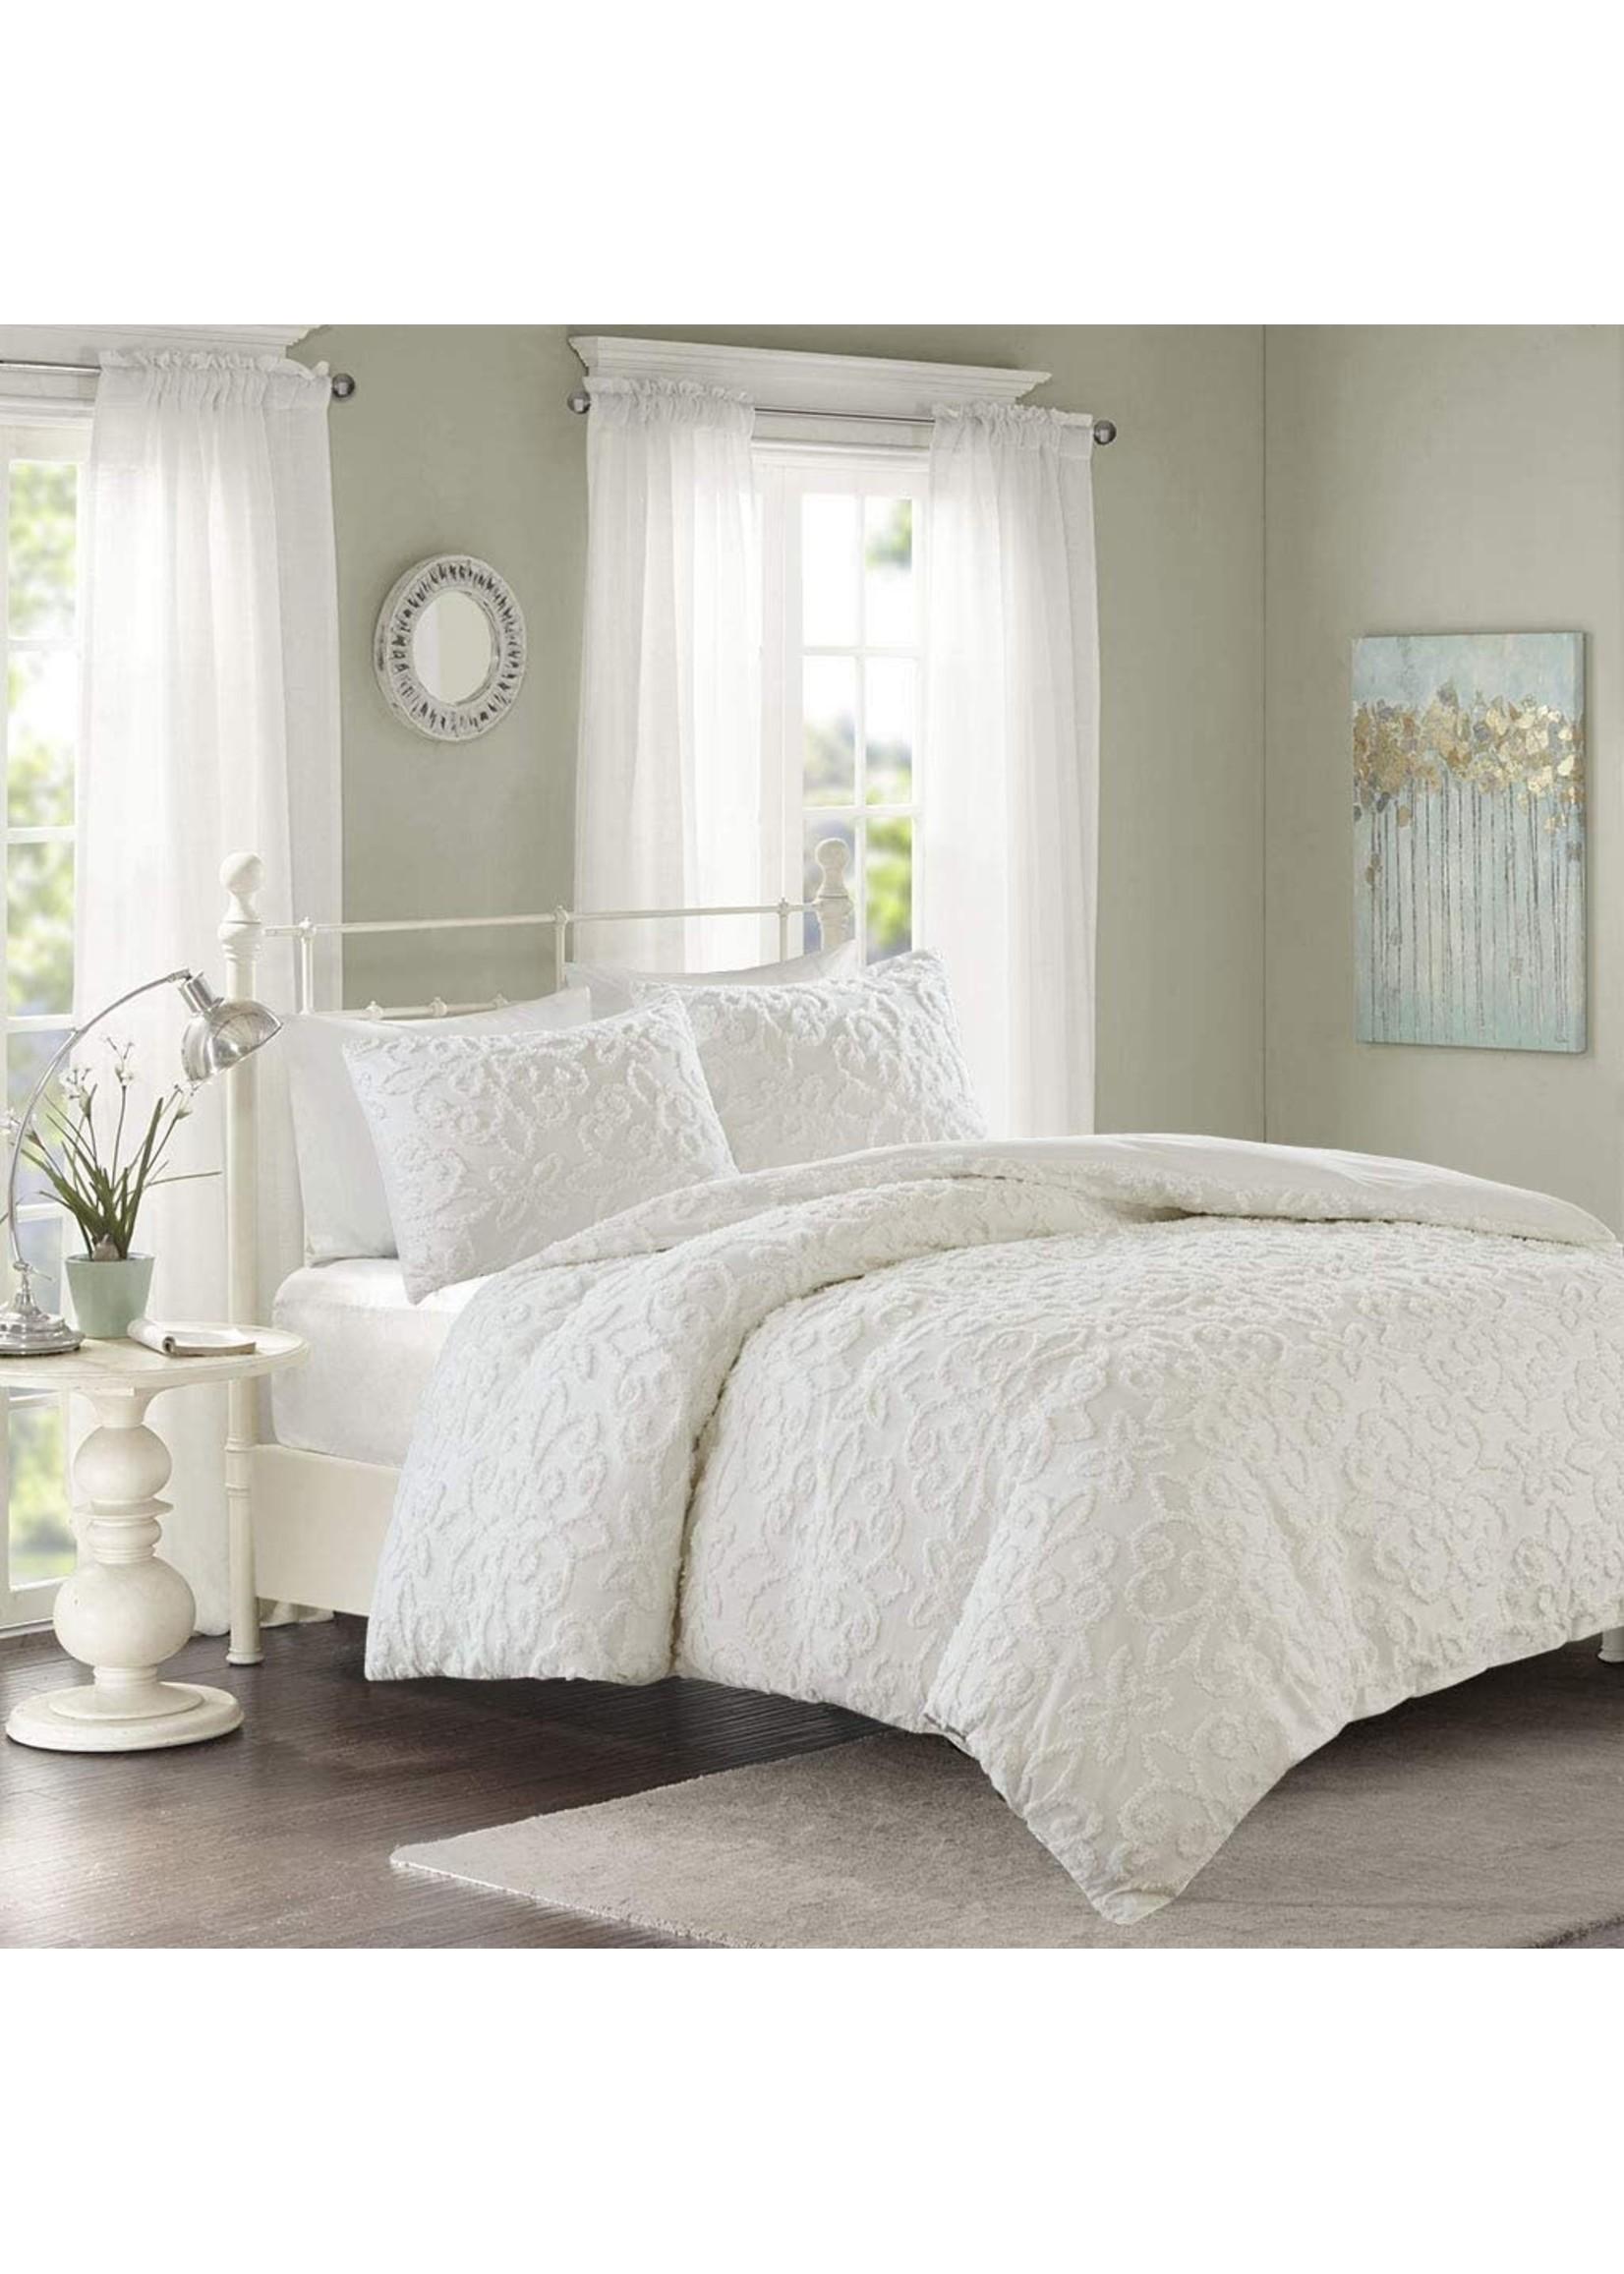 Olliix Viola 2pc Tufted Cotton Chenille Damask Duvet Cover Set Queen White